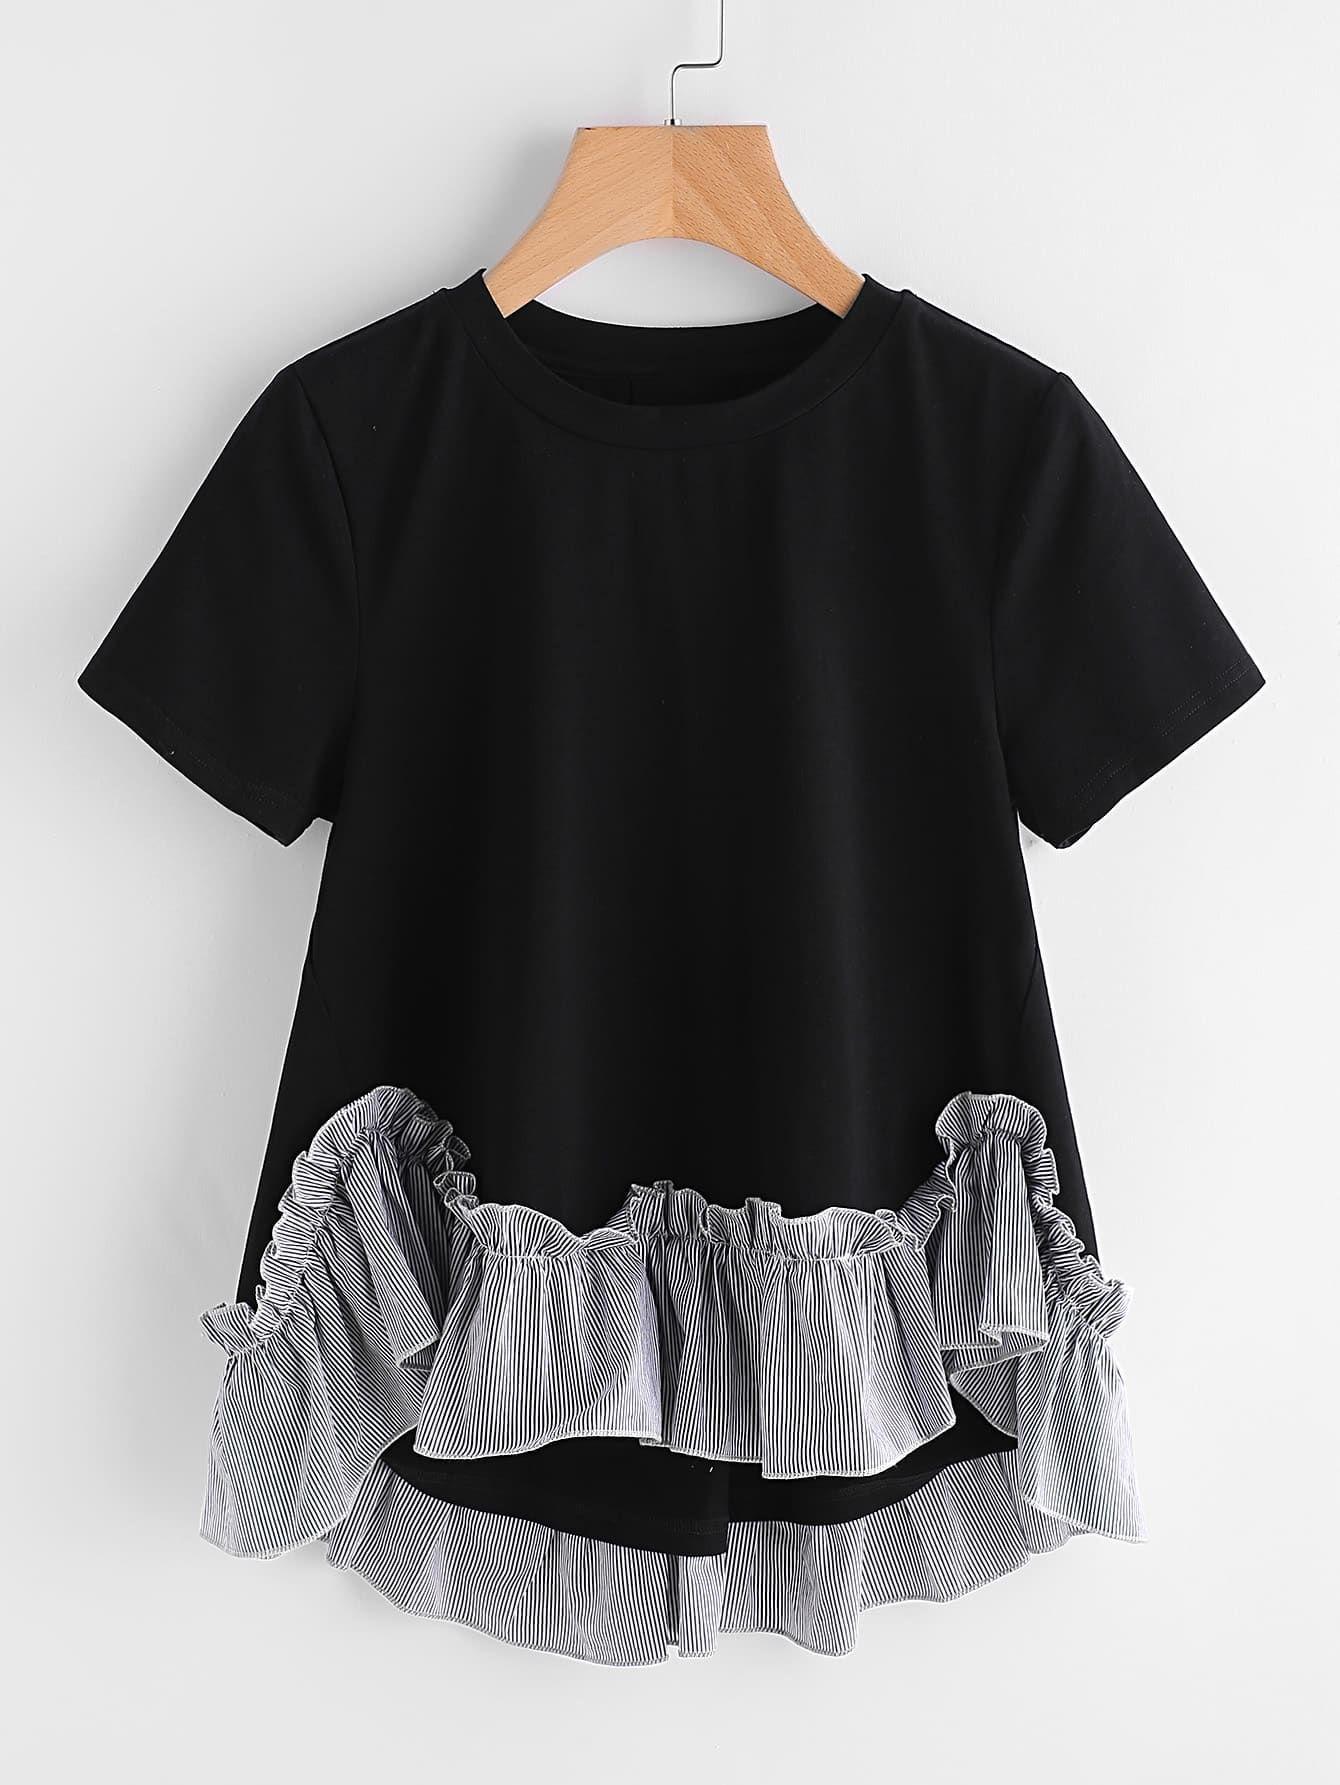 cc26545cb5 Cute Striped Regular Fit Round Neck Short Sleeve Black Striped Ruffle Trim  Hi Lo A Line T-shirt